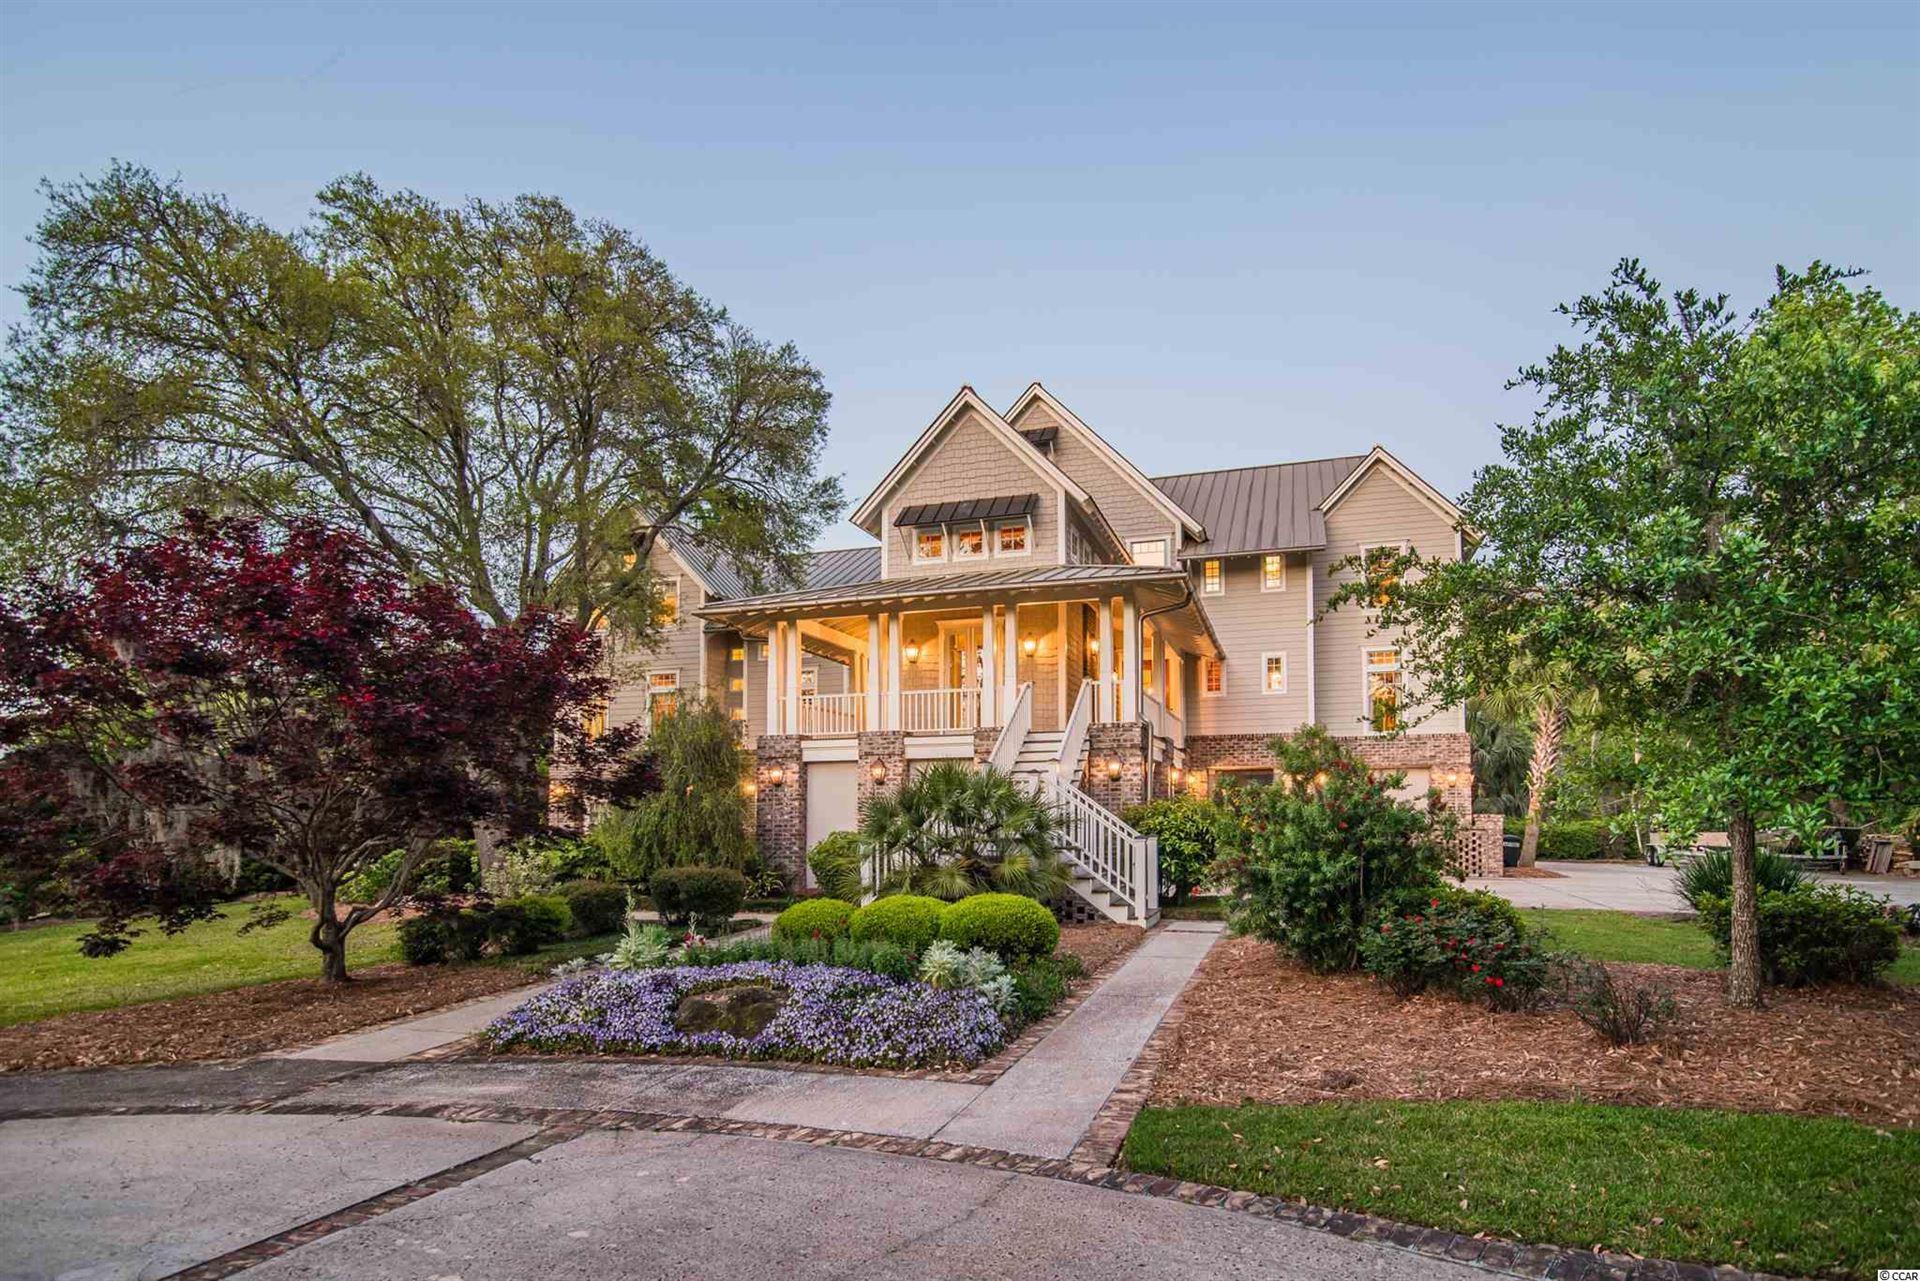 73 Caretaker Ln., Pawleys Island, SC, 29585 Real Estate For Sale